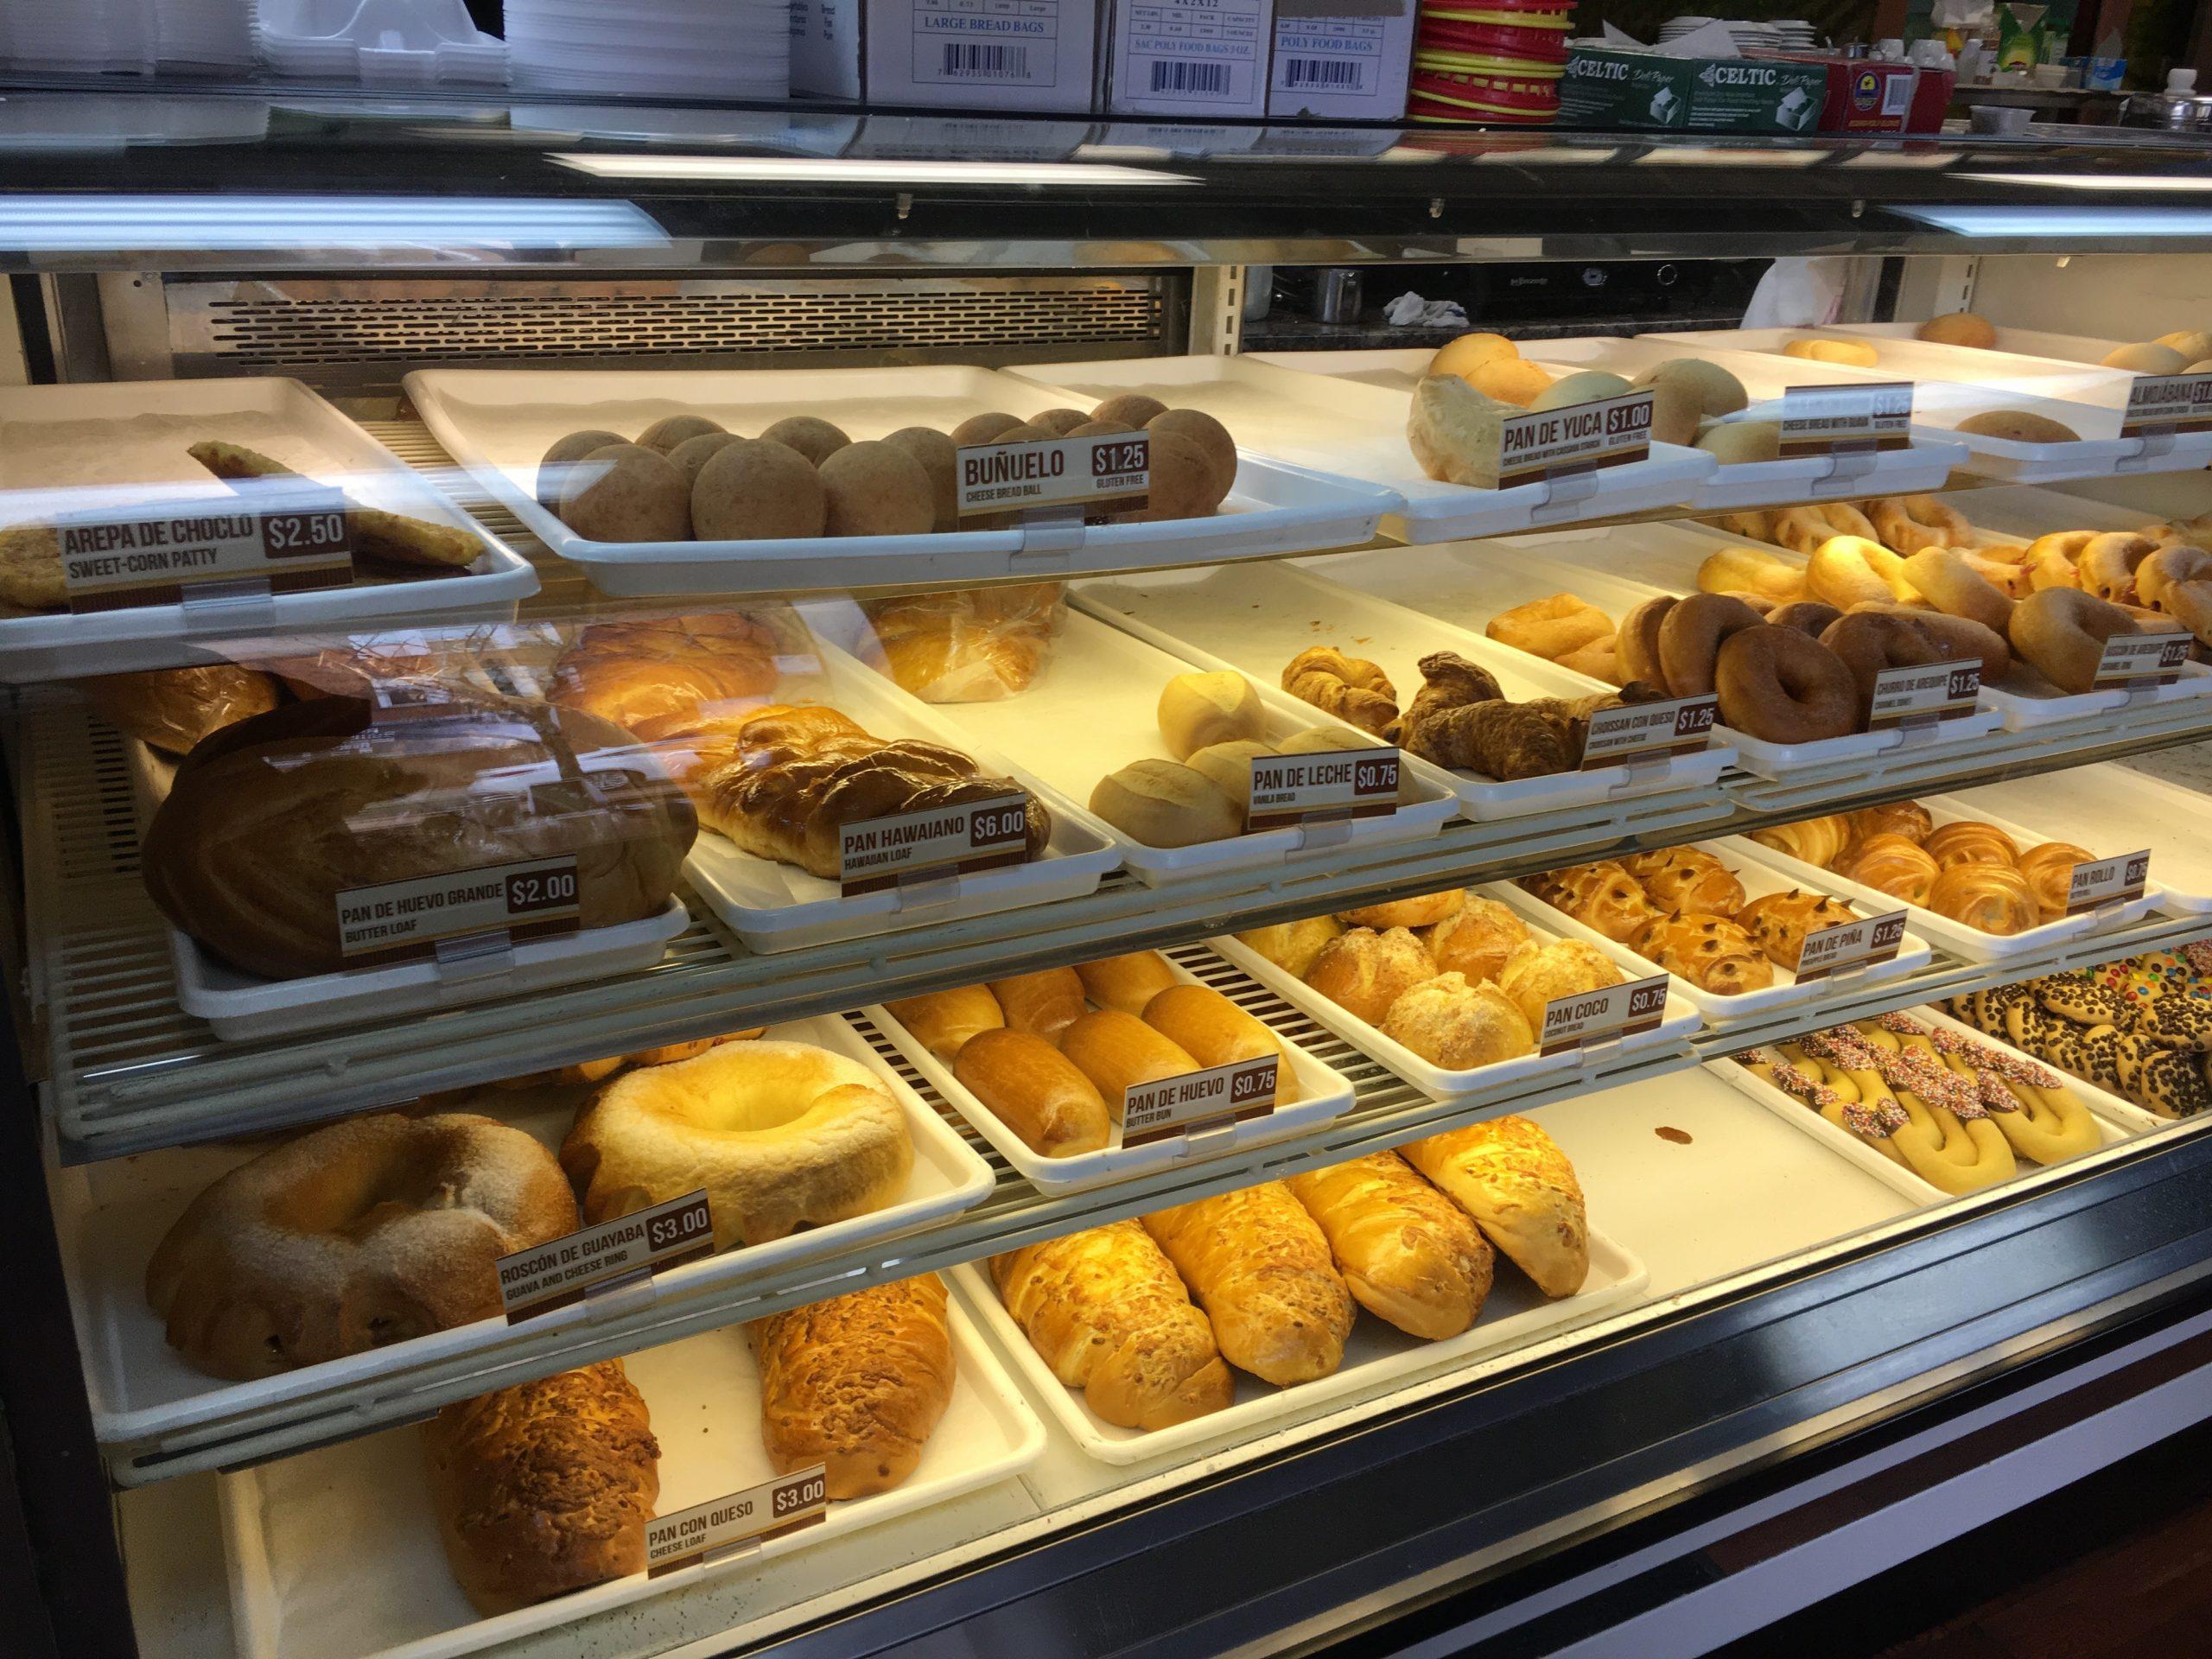 Bakery case at Pizza y Pan Pa' Ya